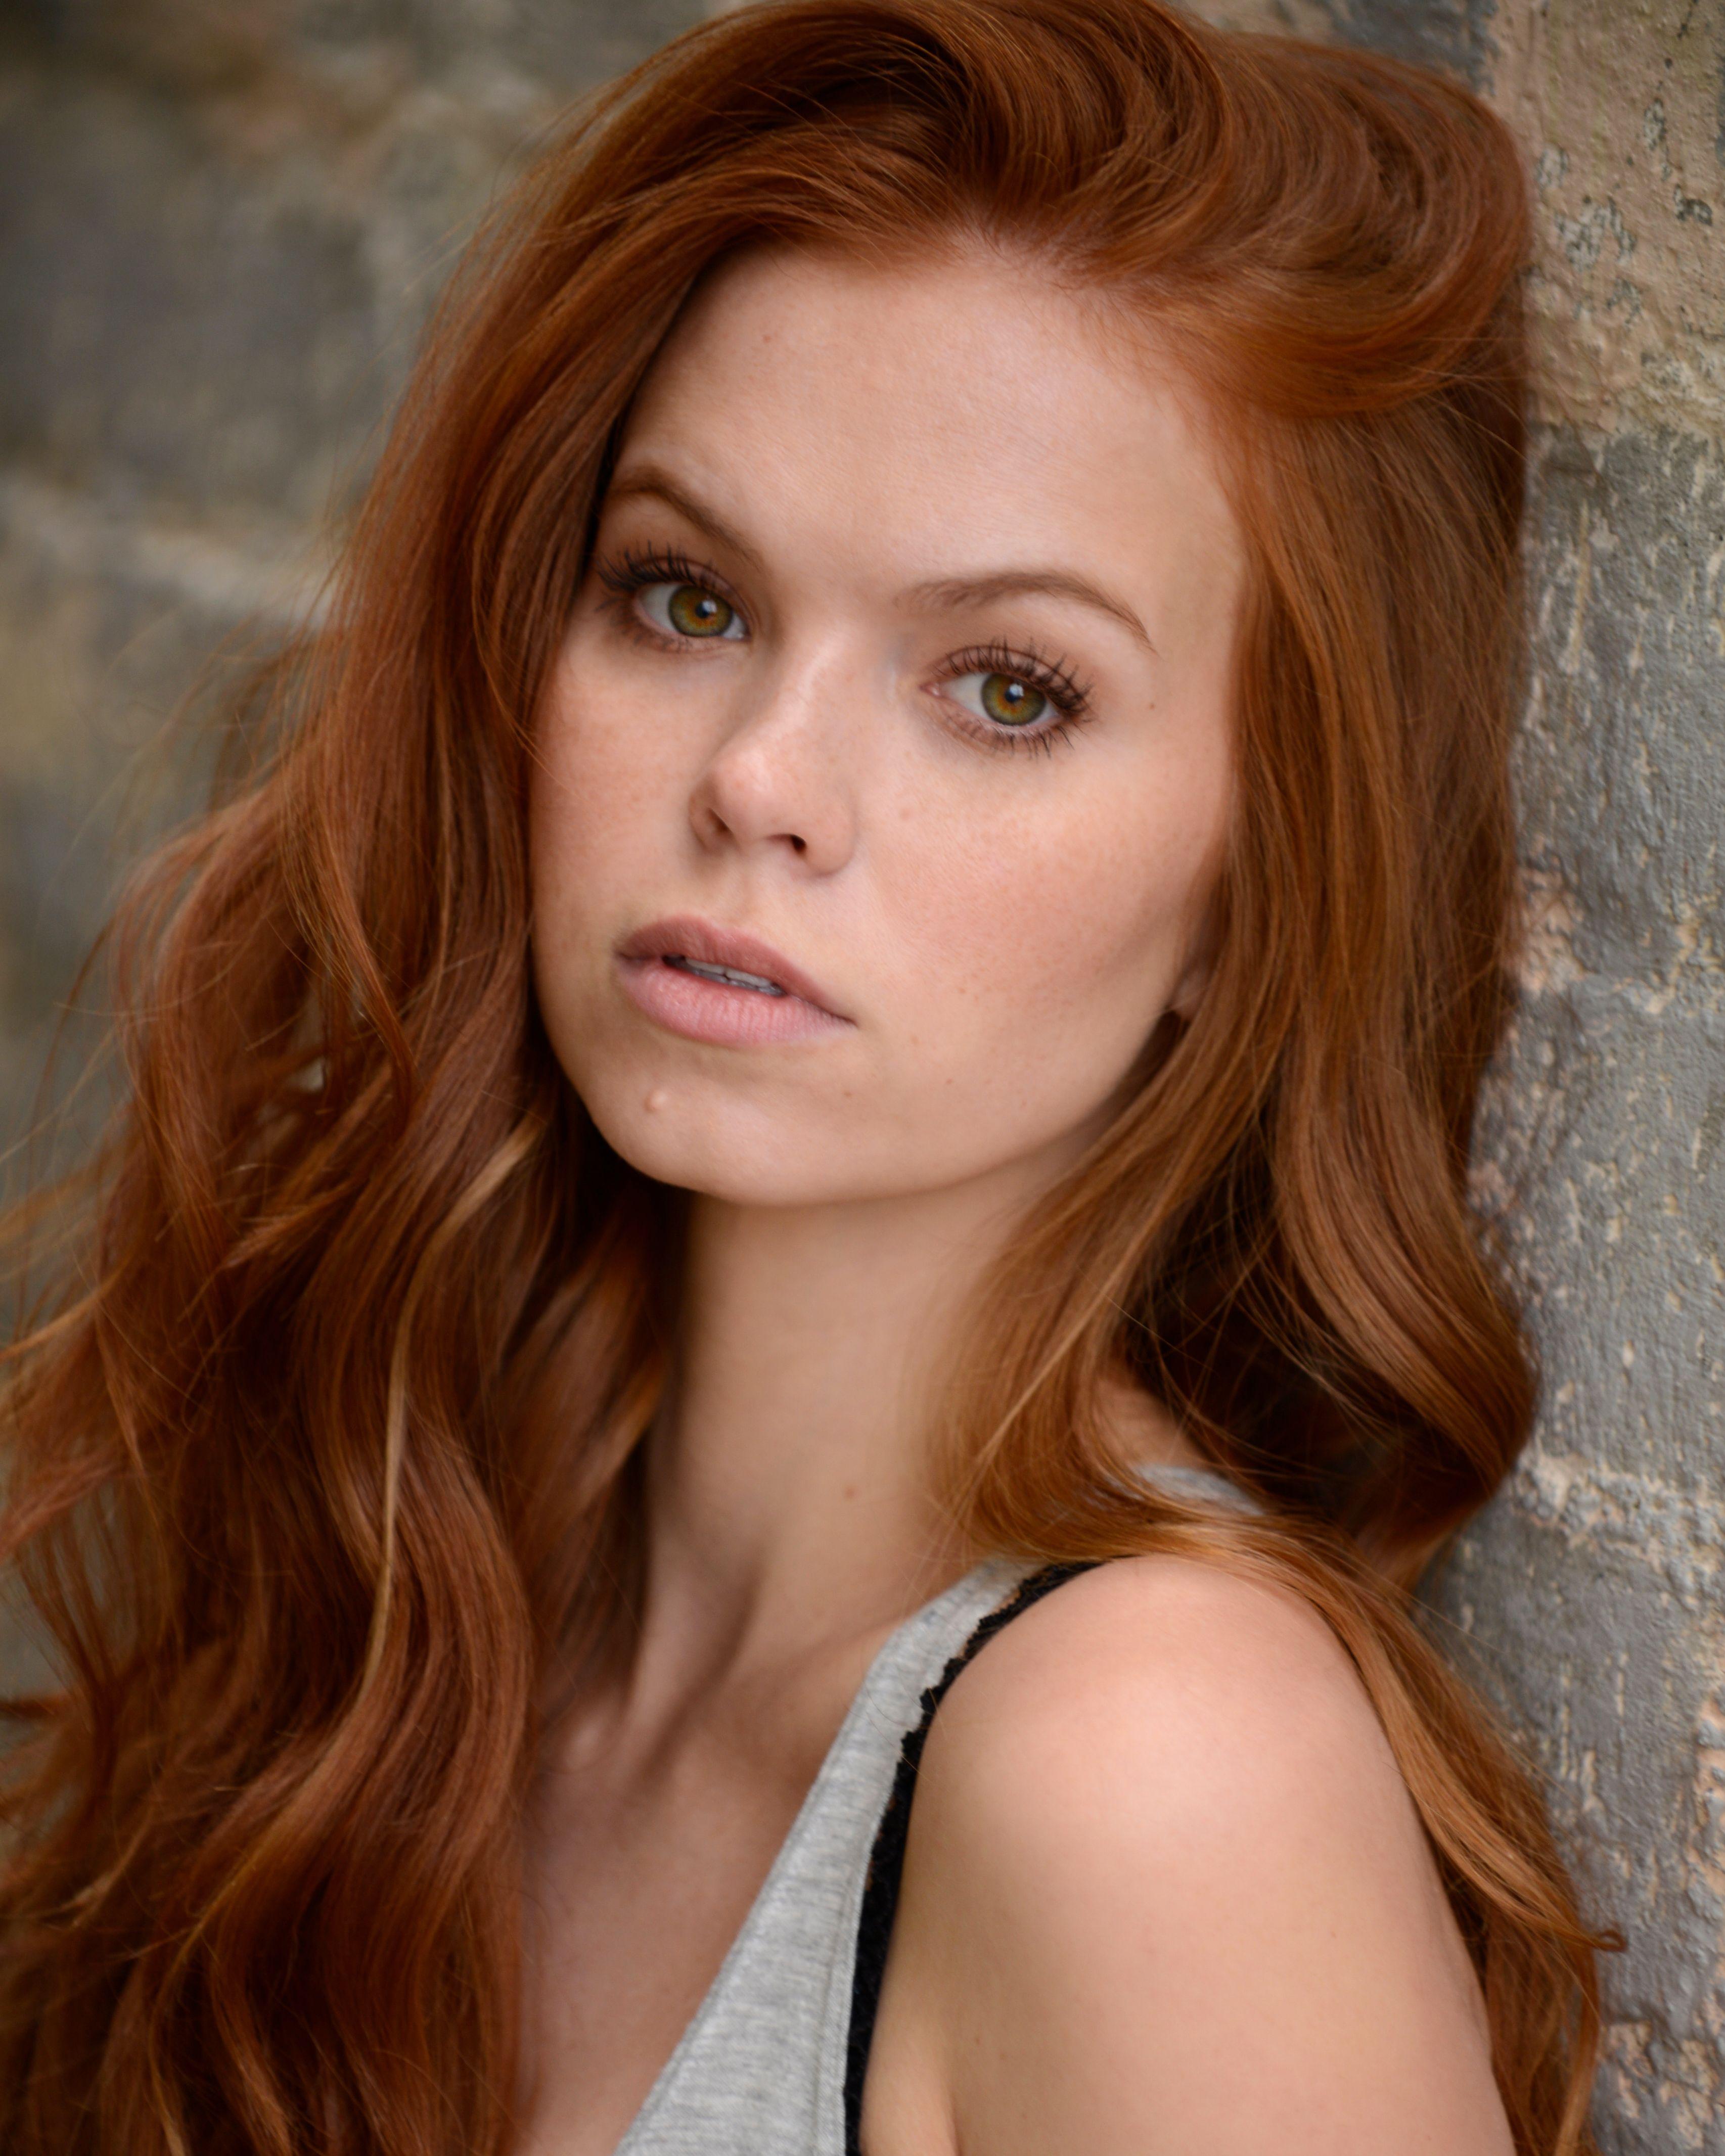 Gorgeous natural redhead